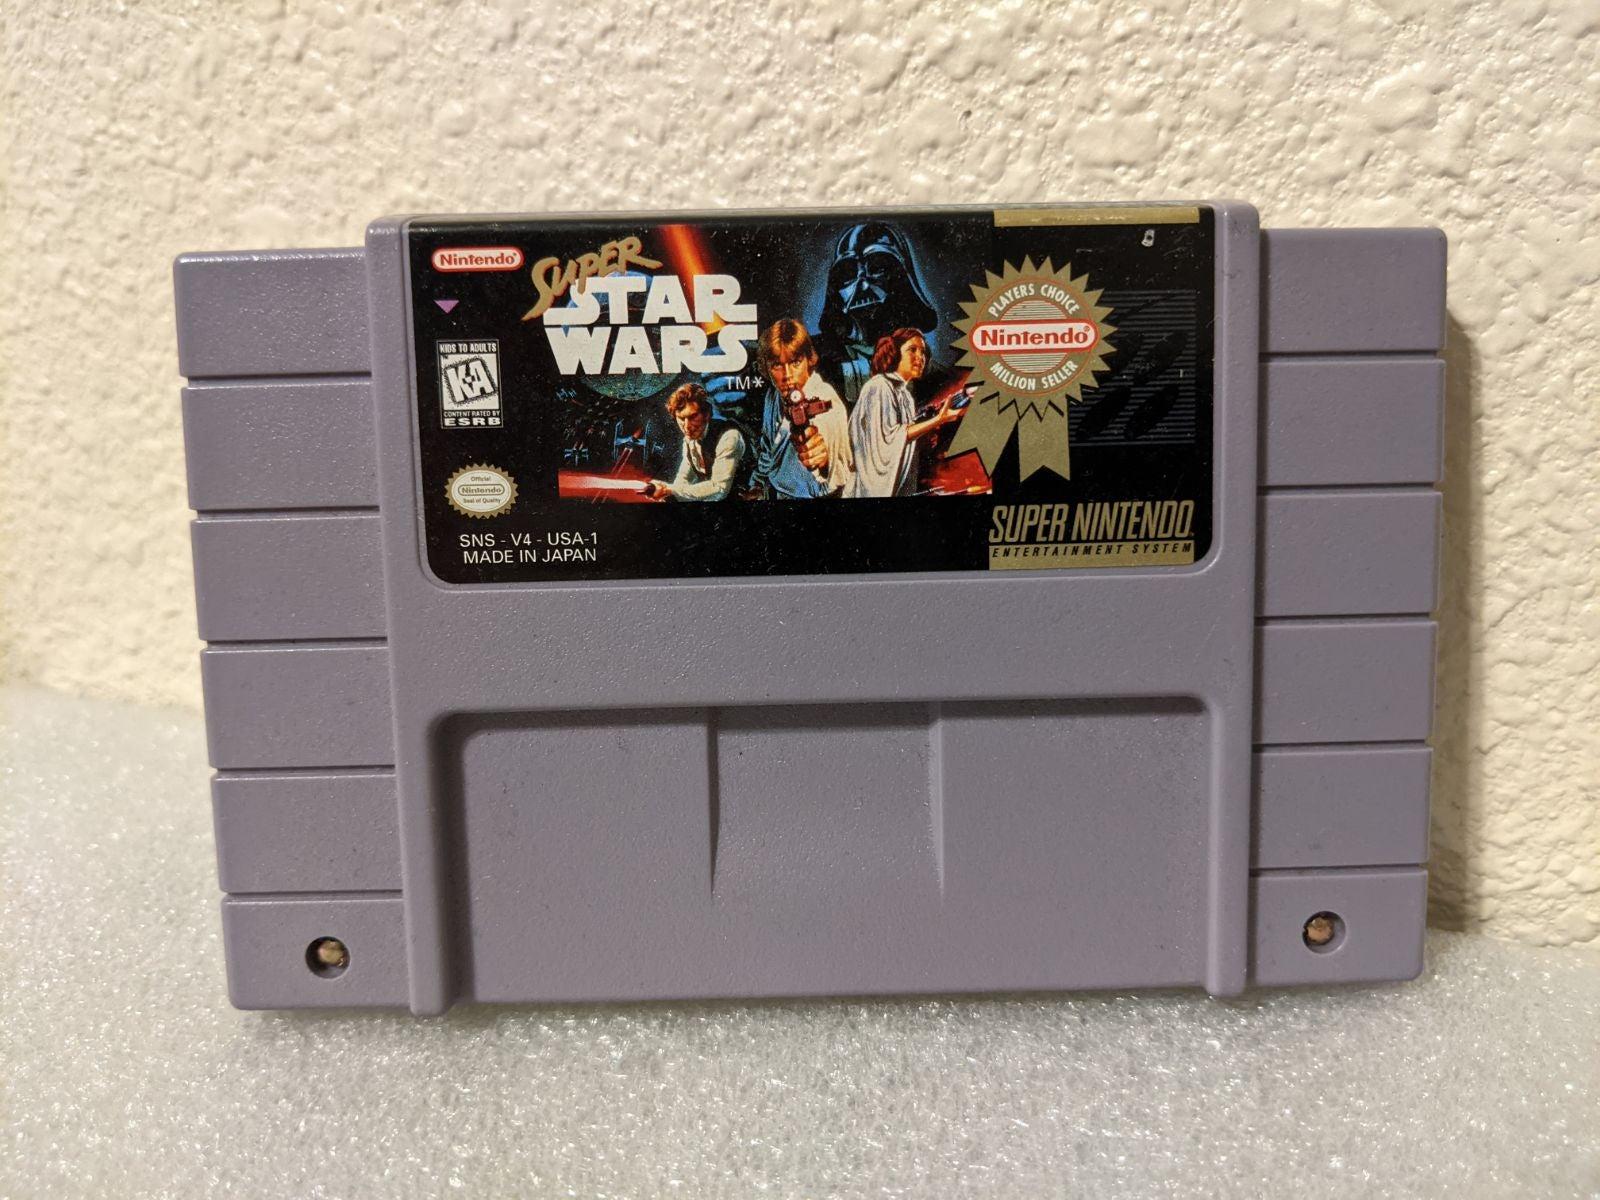 Super Star Wars on Nintendo Super NES